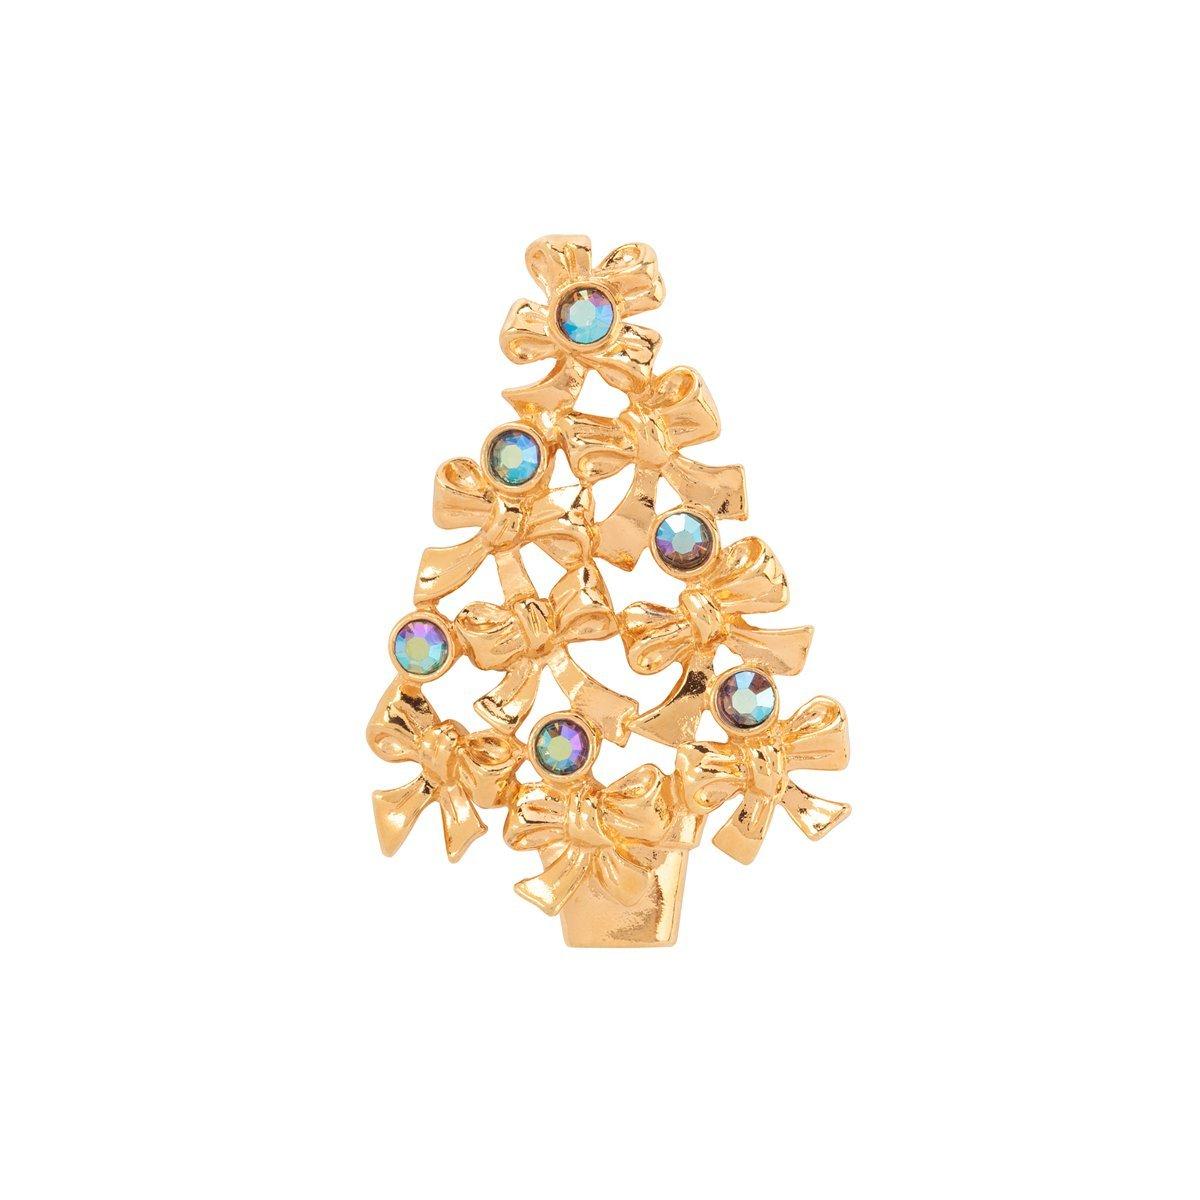 1970S VINTAGE AVON CHRISTMAS TREE BROOCH